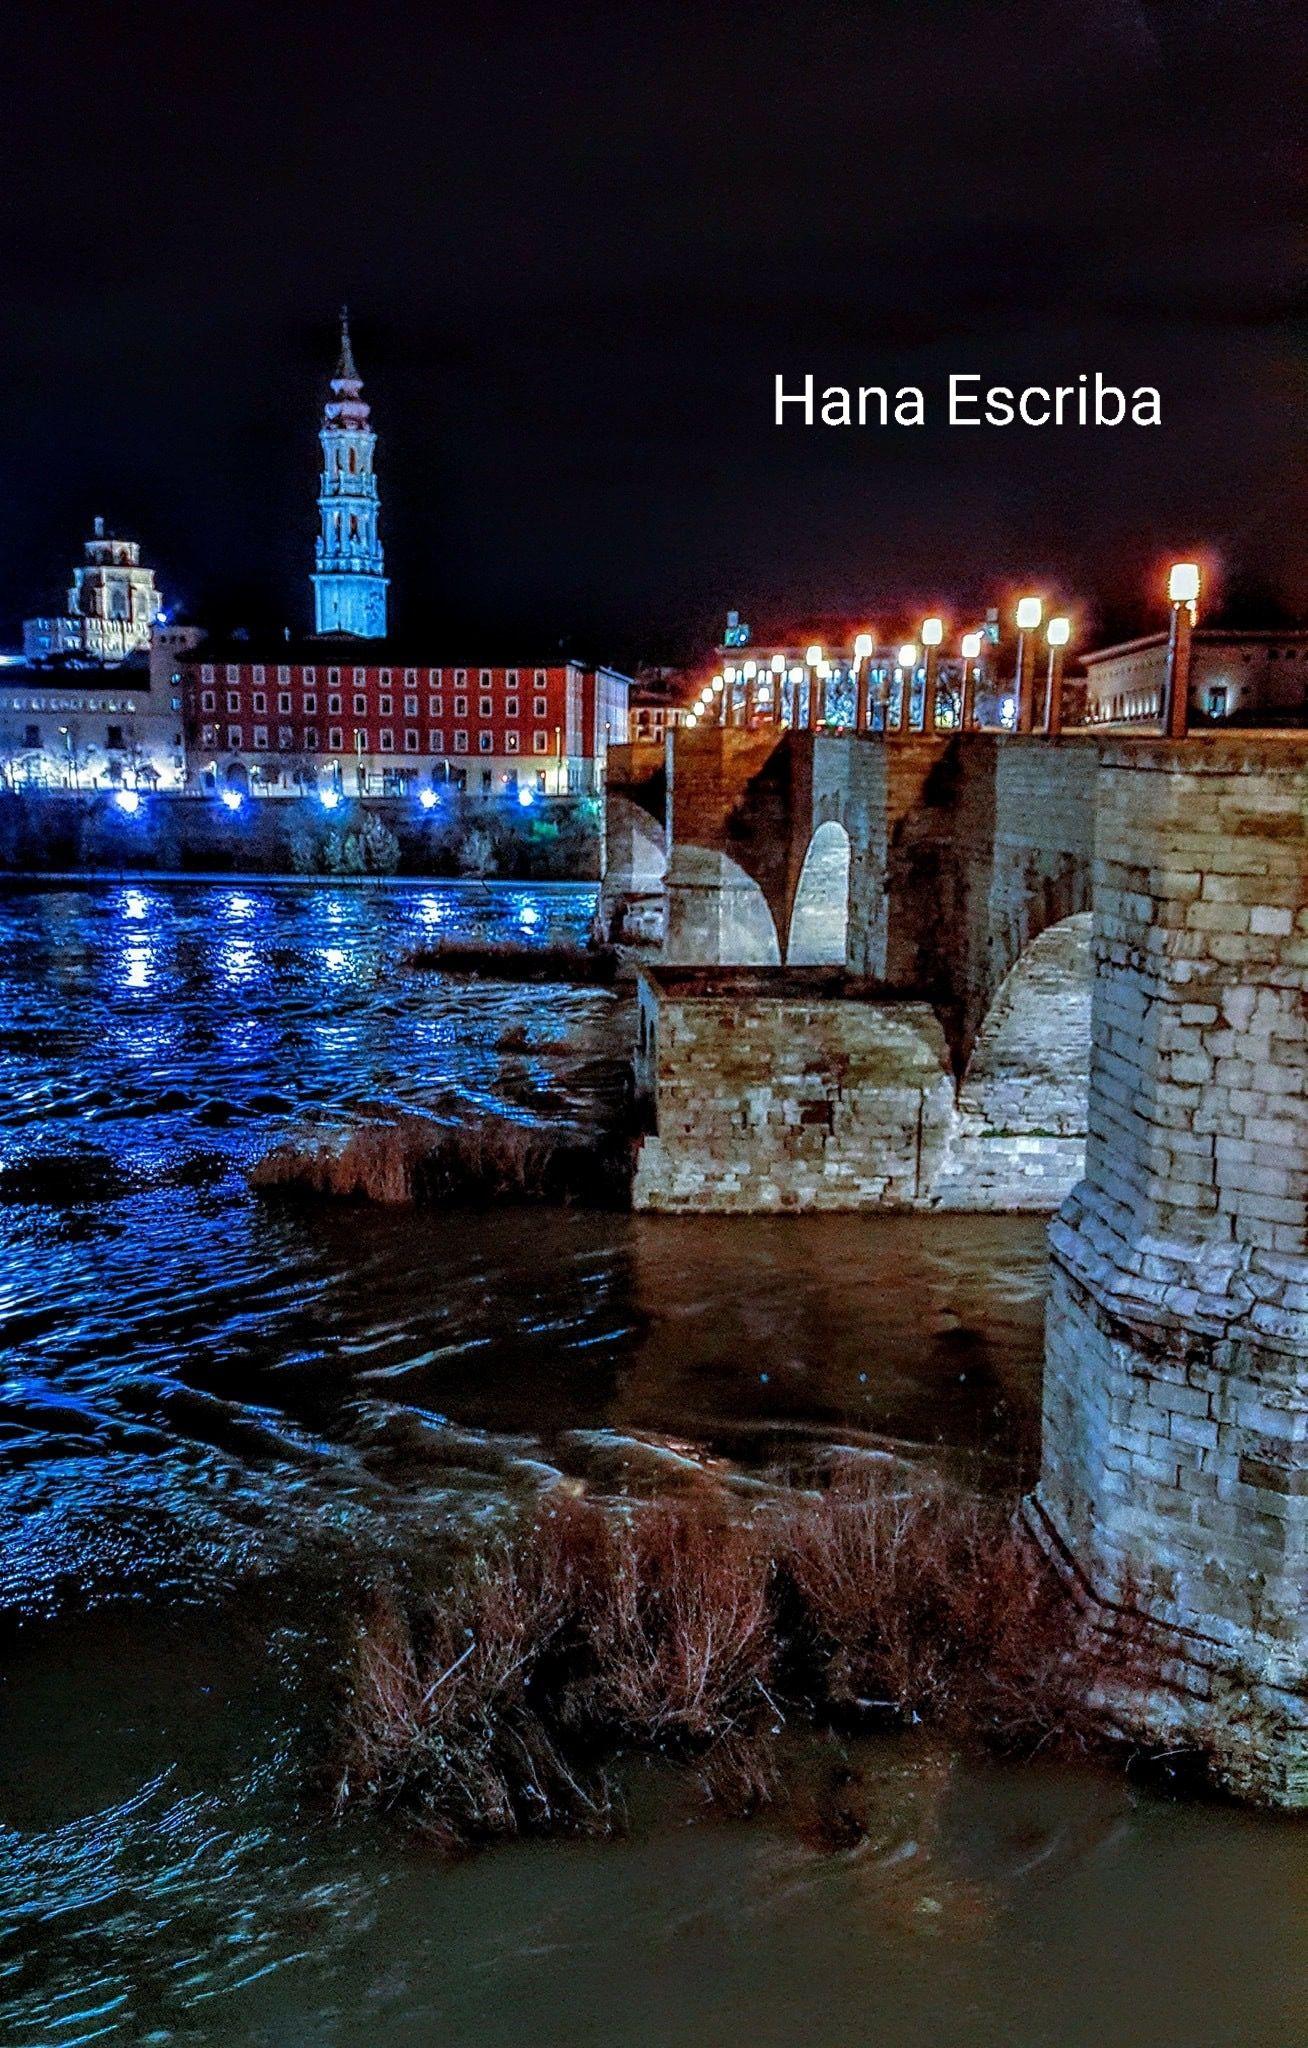 Catedral De La Seo En Zaragoza Desde La Otra Orilla Del Ebro  # Muebles Mezquita Alcanices